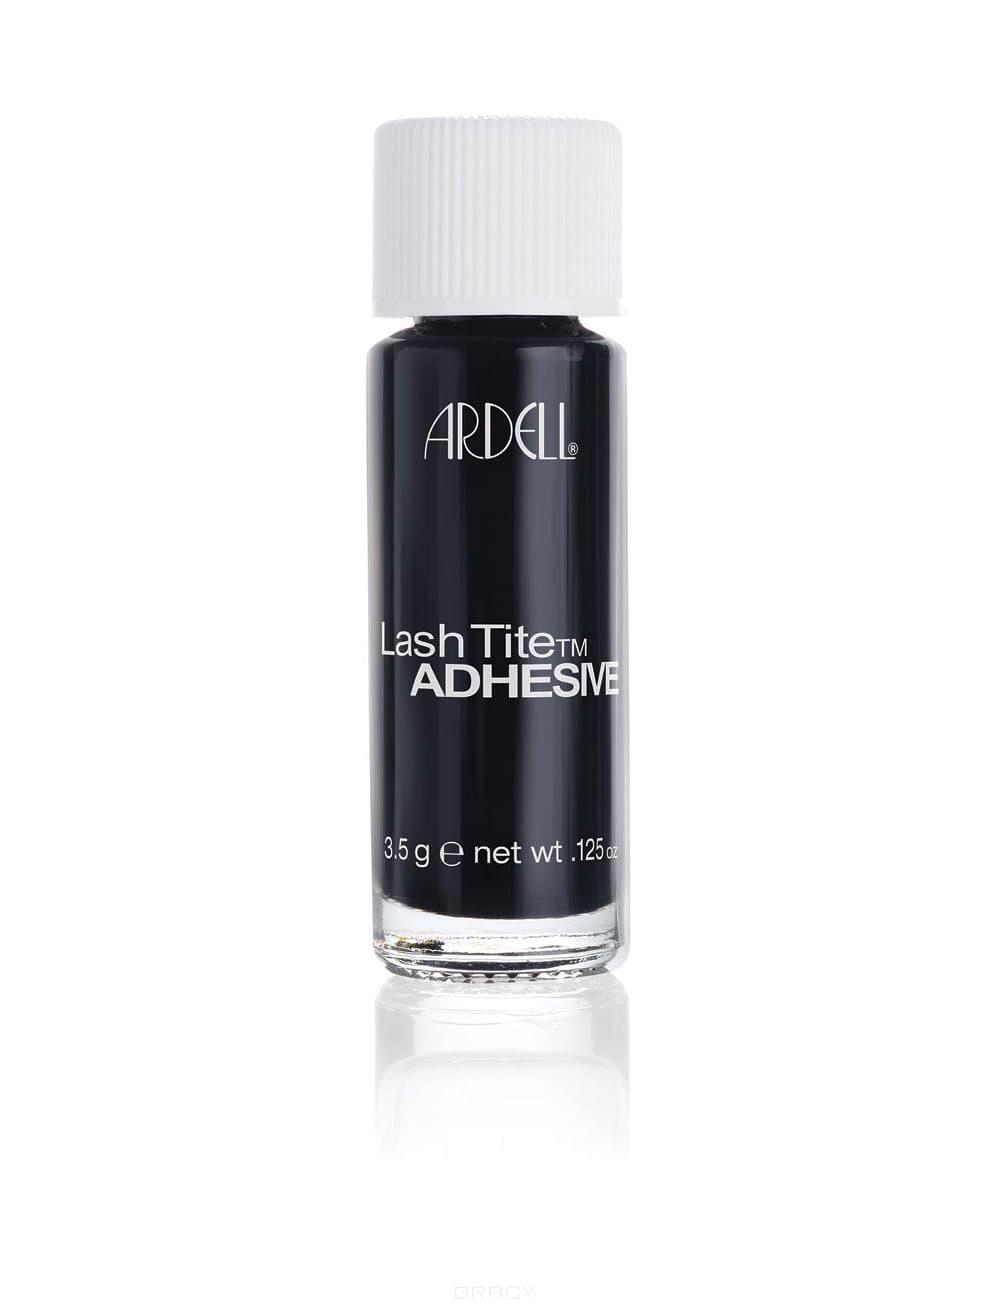 Ardell, Lashtite Adhesive Dark Клей для пучков темный, 3,5 грНаращивание ресниц<br><br>